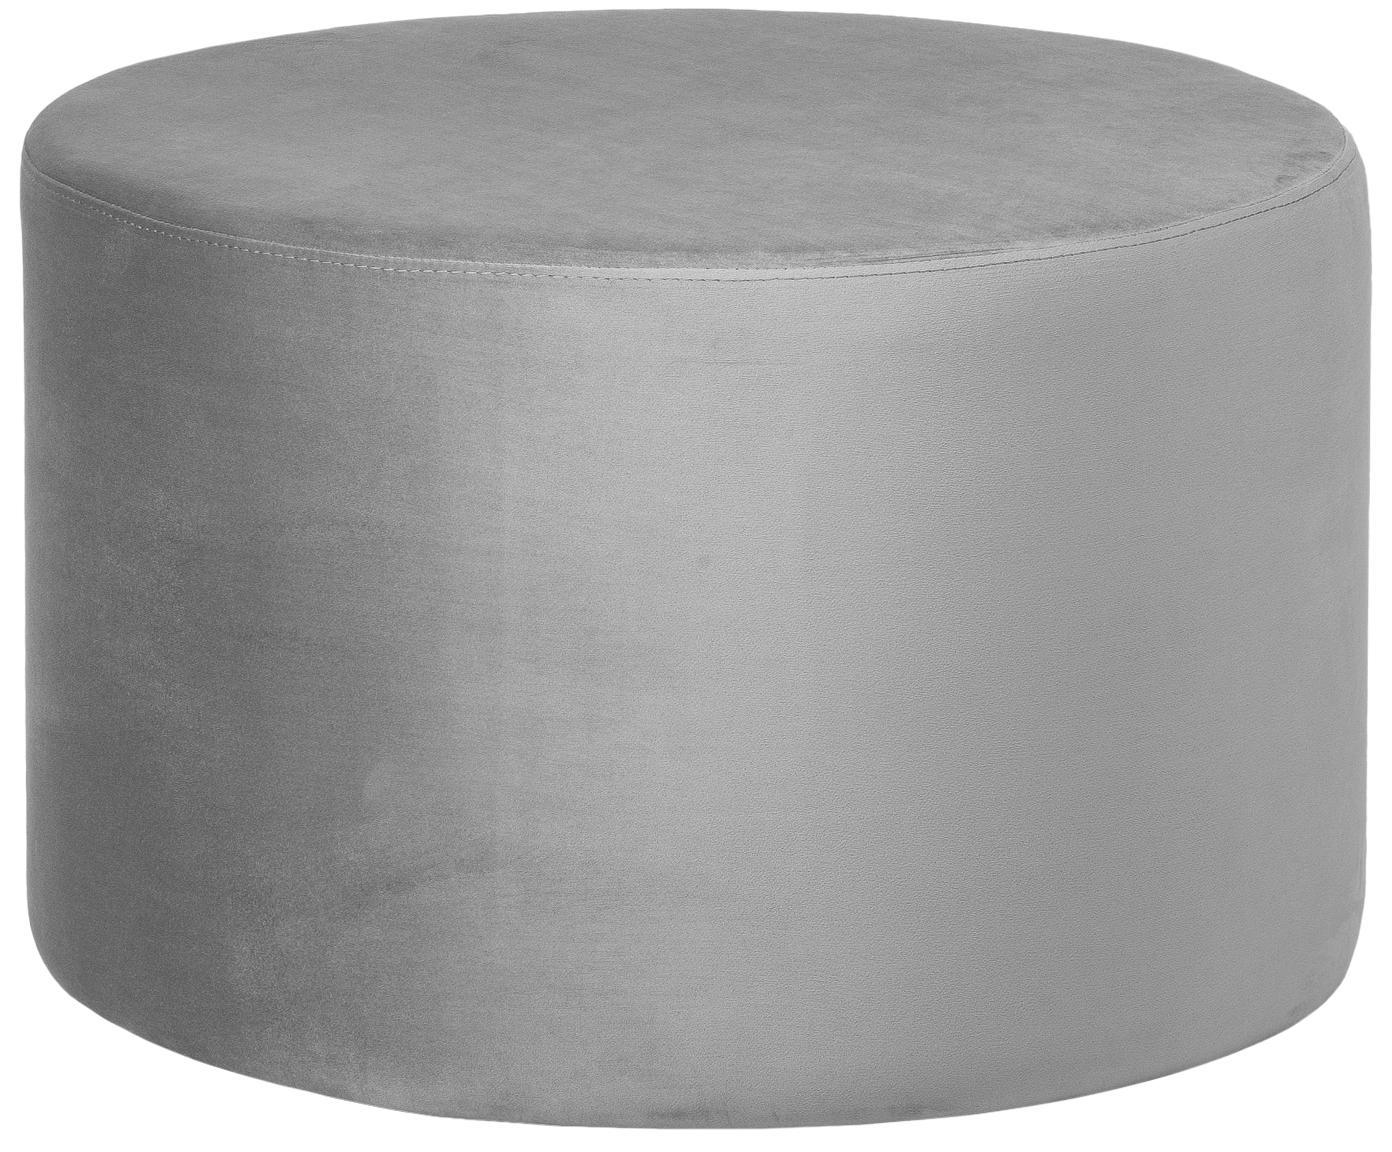 Samt-Hocker Daisy, Bezug: Samt (Polyester) 15.000 S, Rahmen: Mitteldichte Holzfaserpla, Grau, Ø 60 x H 41 cm